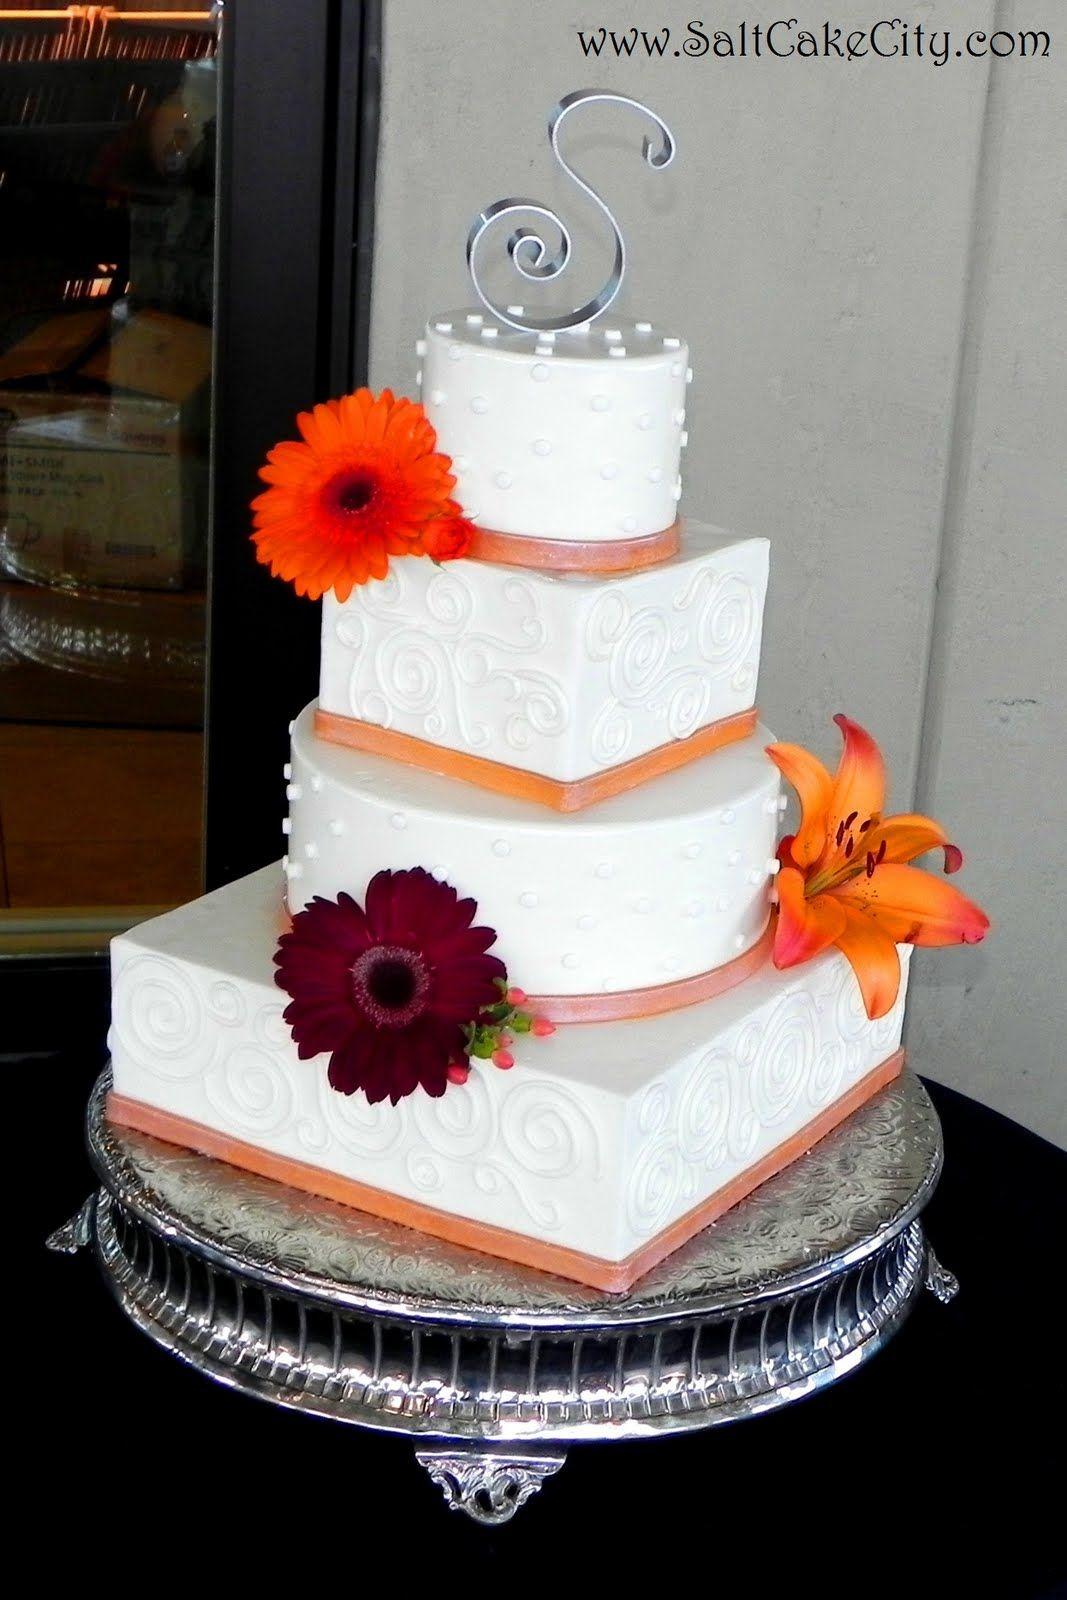 Simple wedding cake designs simple wedding cake designs ideas